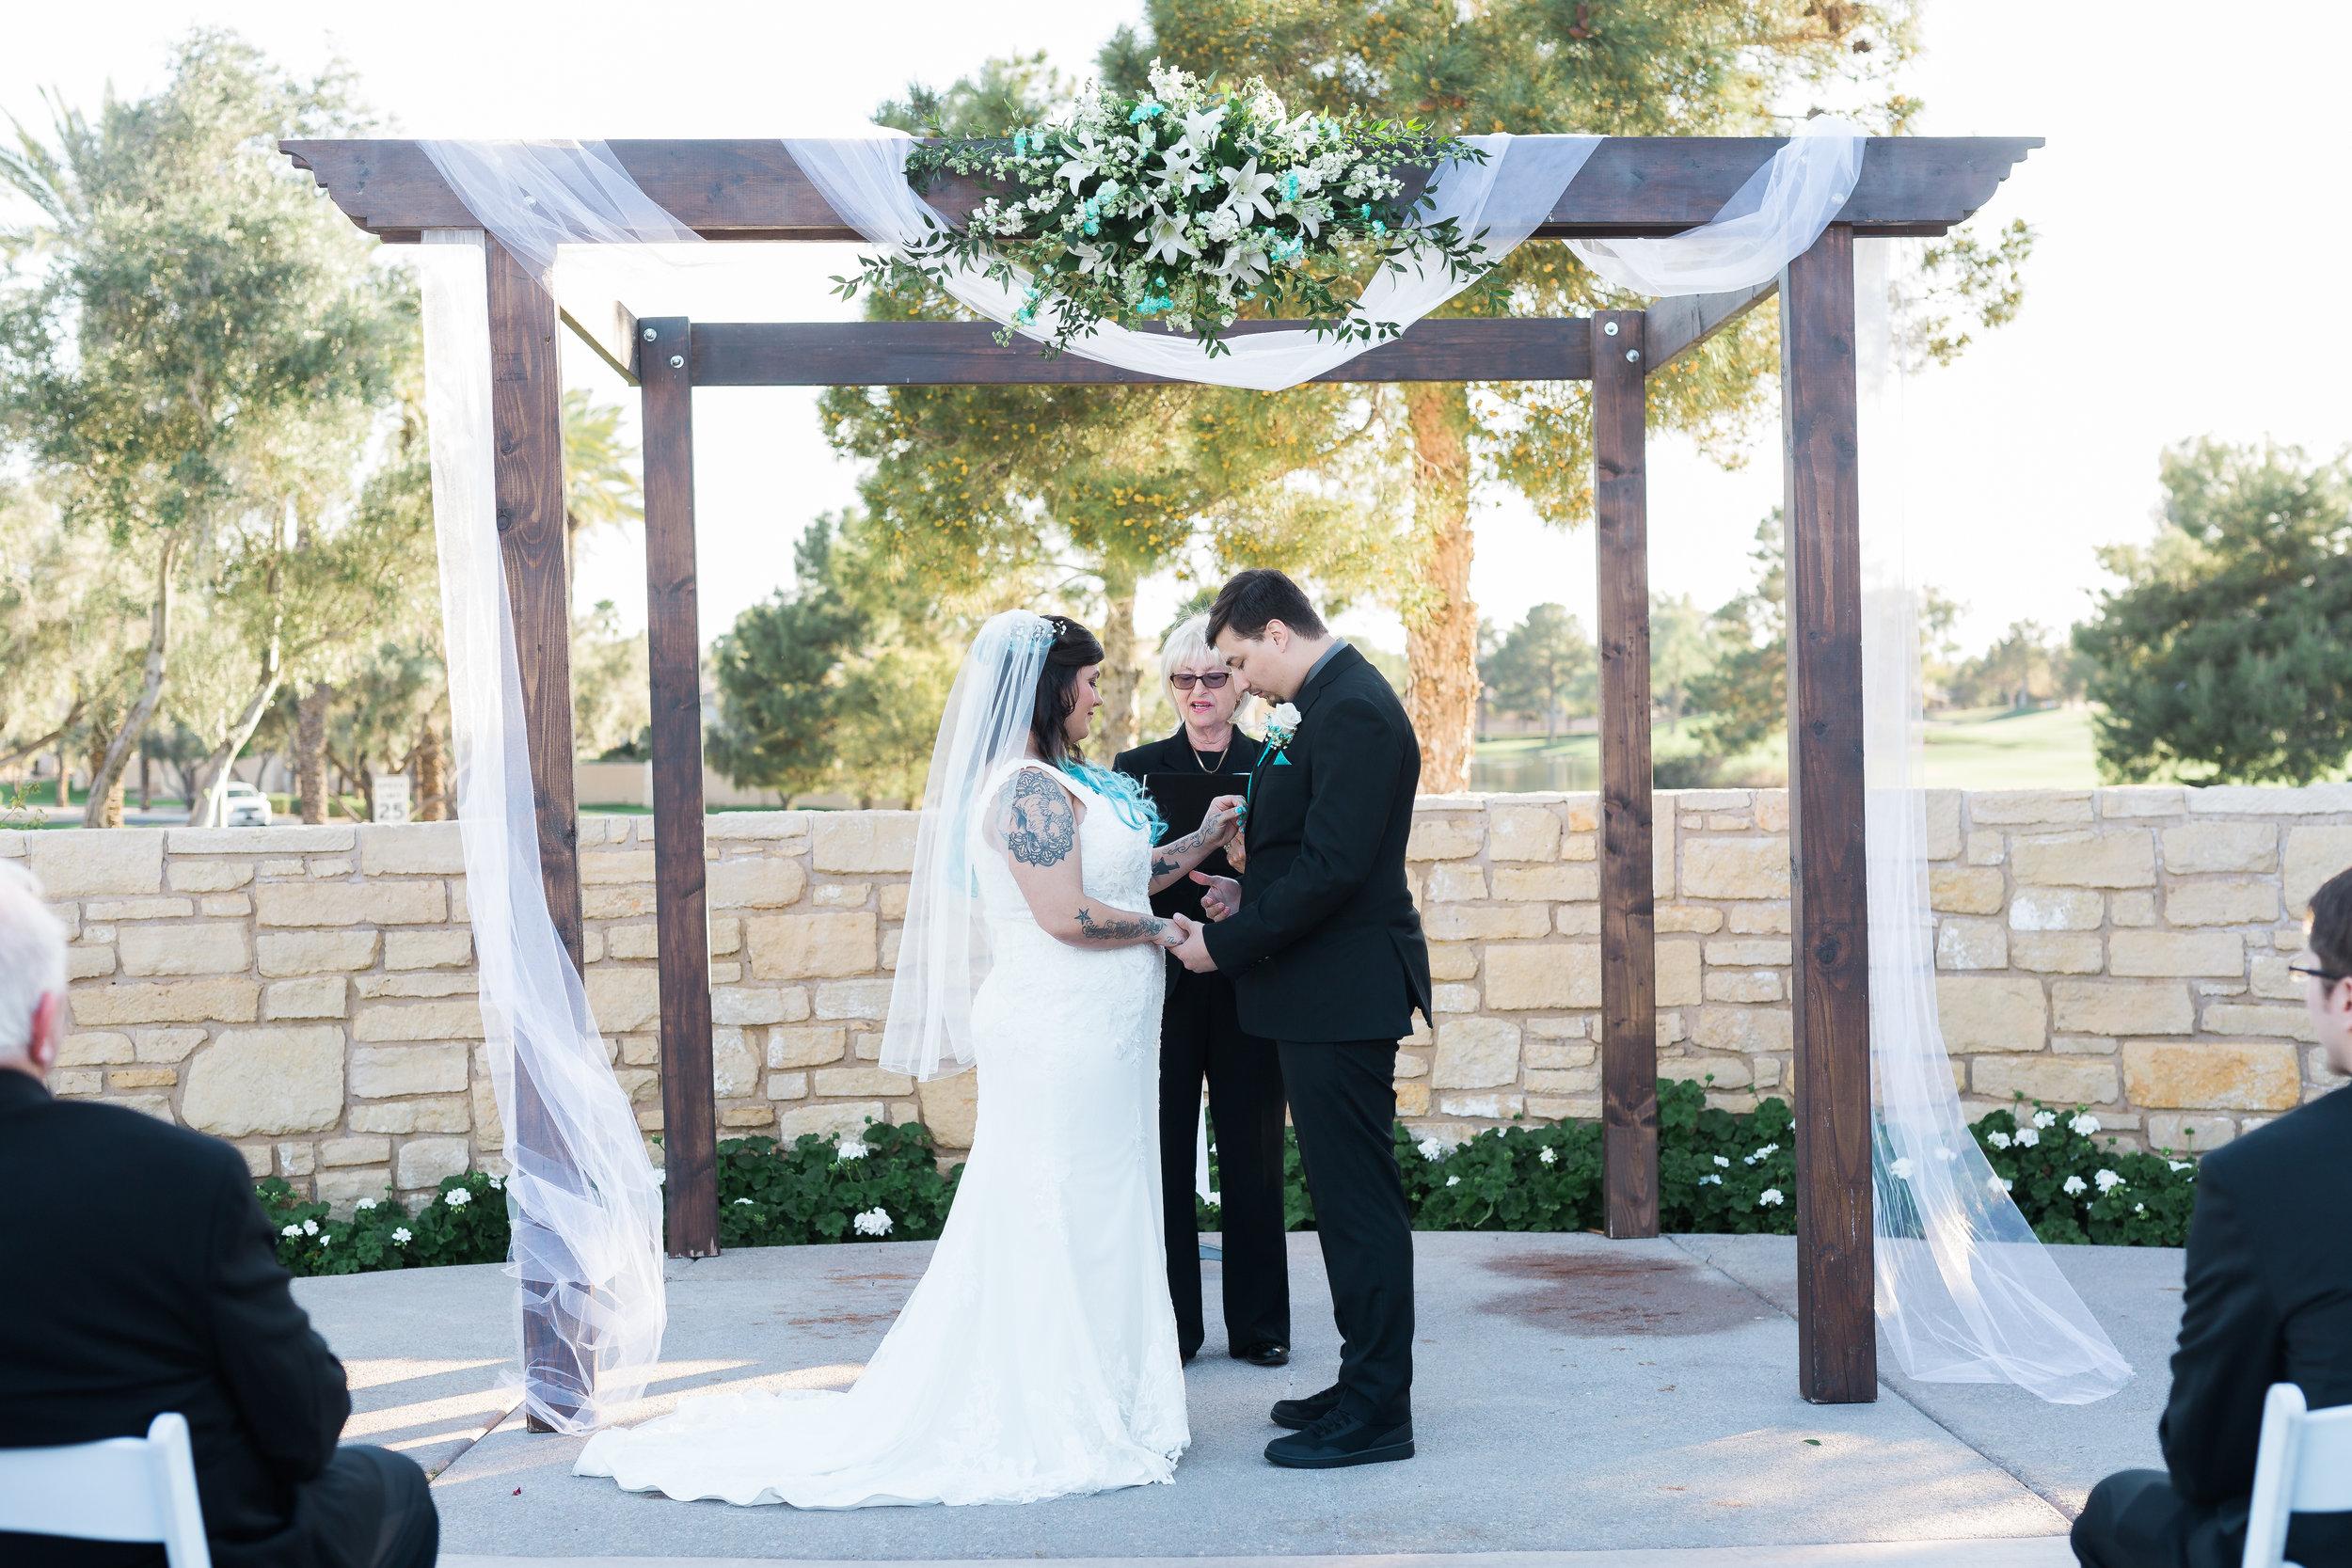 Carlos-Kayla-Wedding-Tara-Nichole-Photo-Wedgewood-Chandler-Arizona-250.jpg